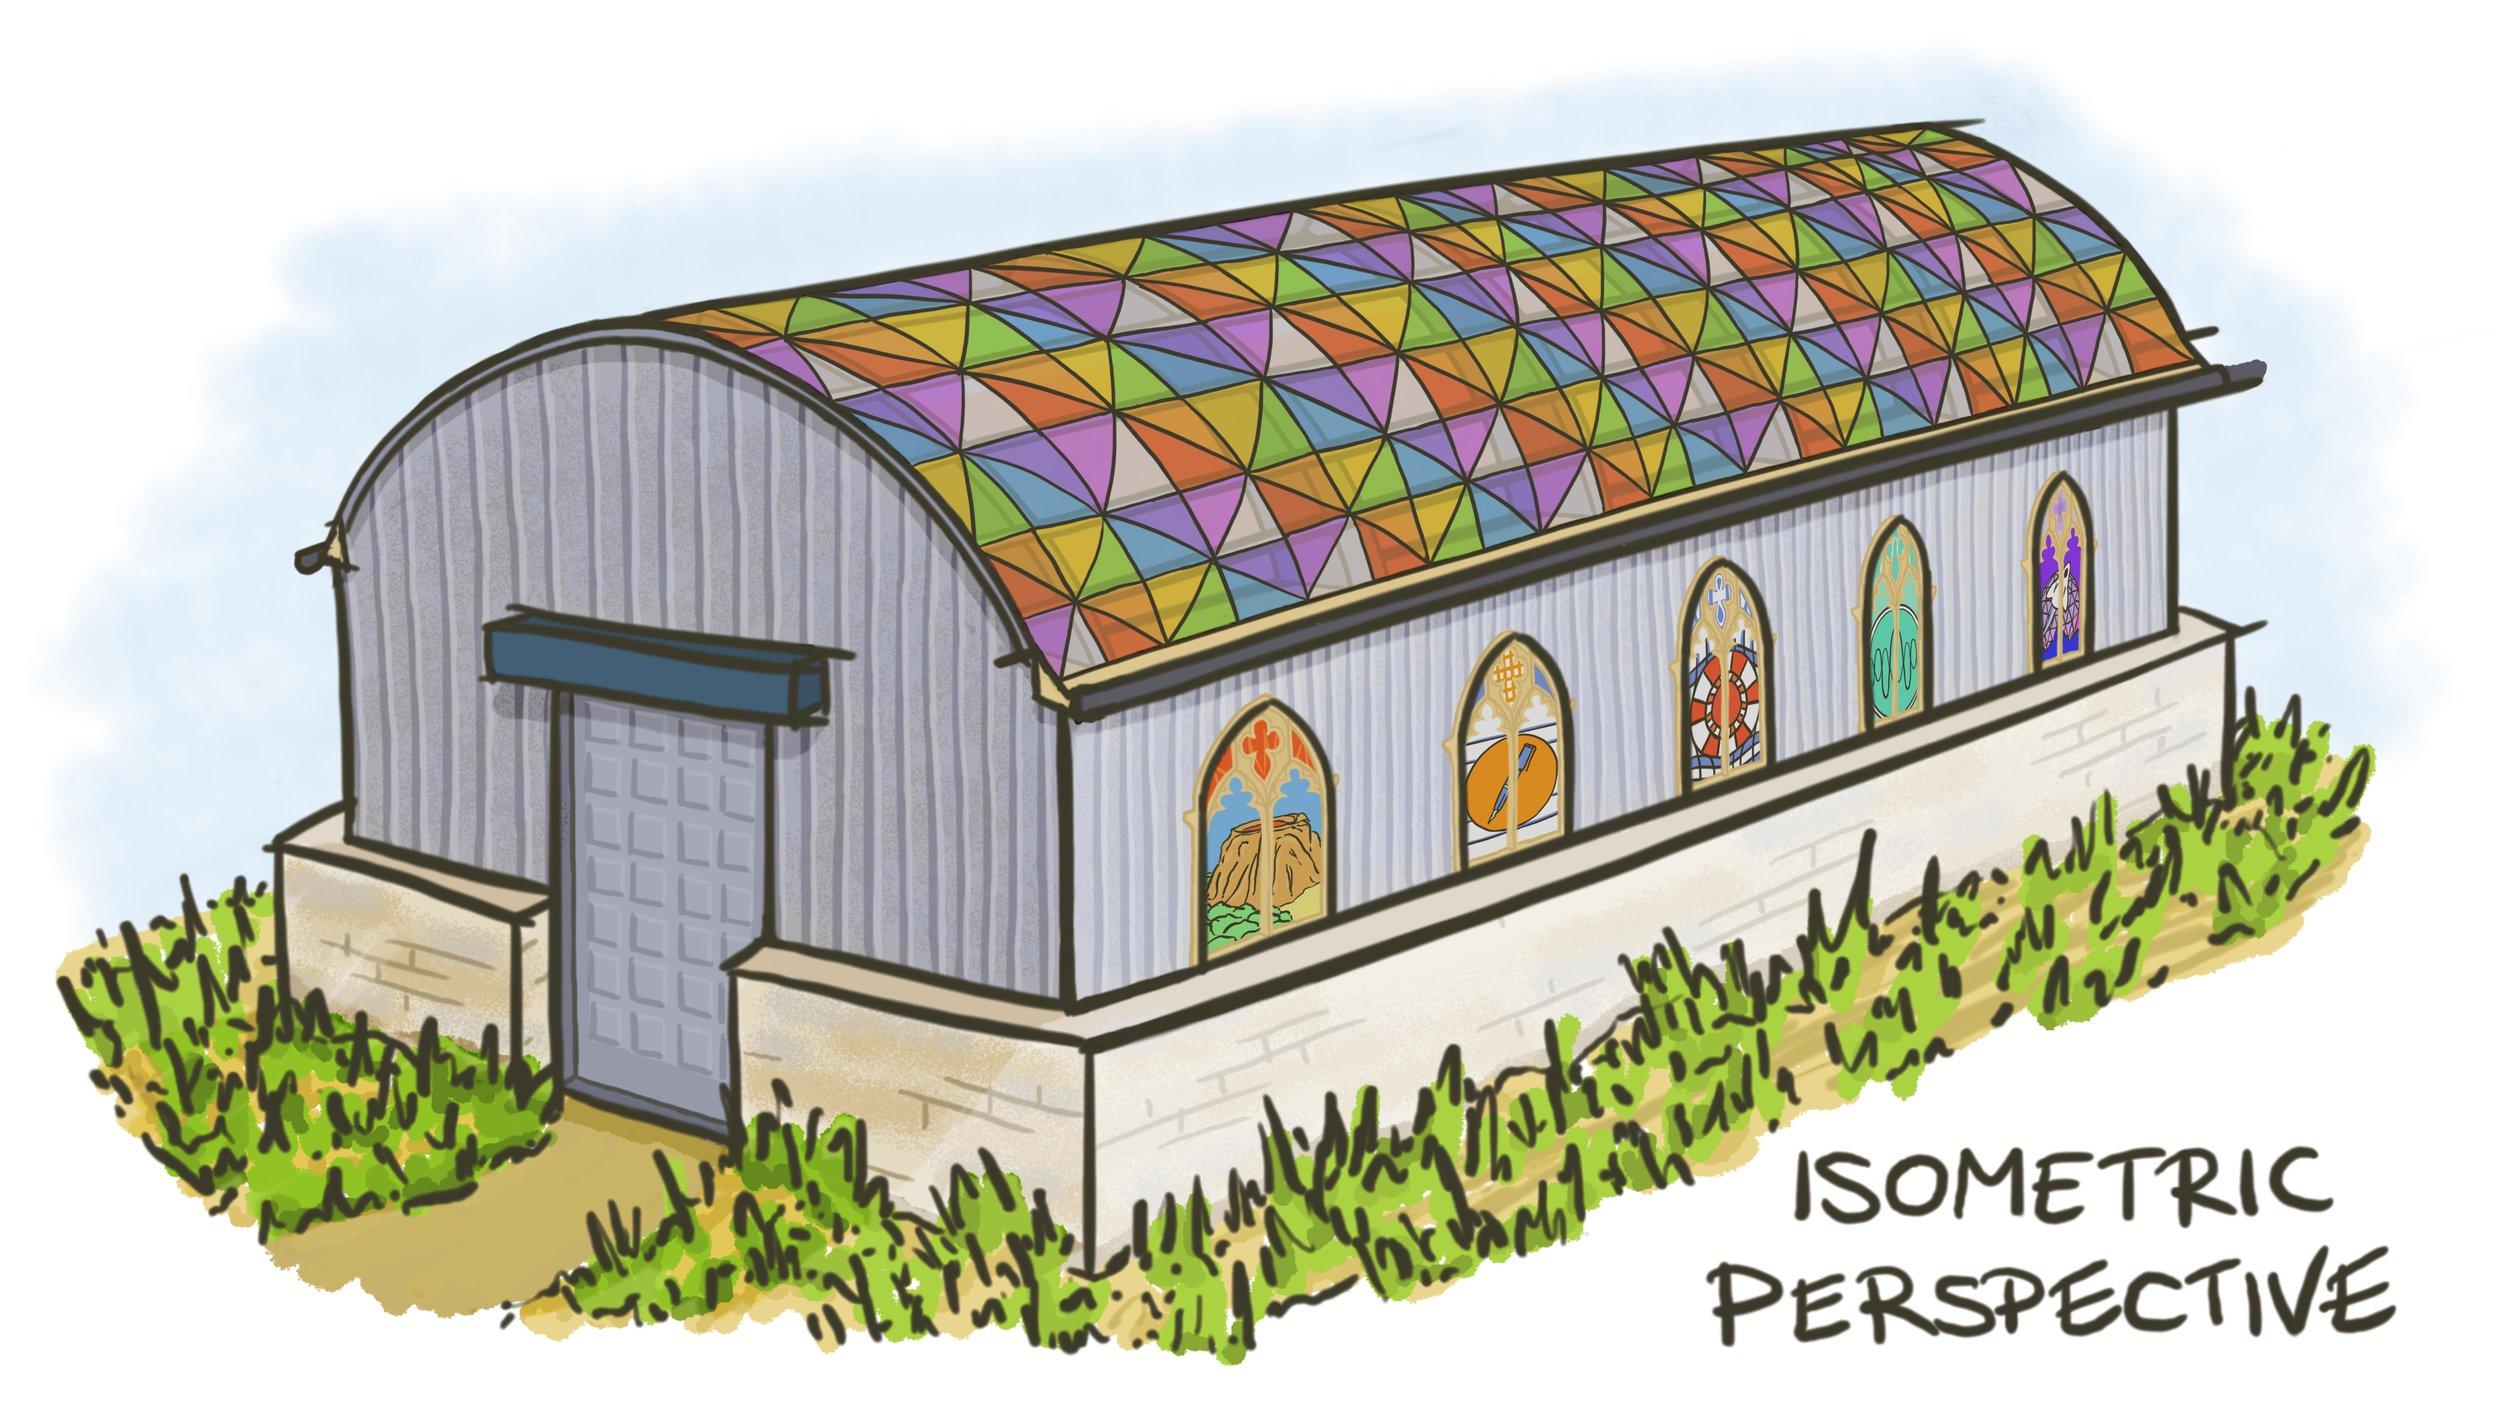 stained glass warehouse v2 iso.jpg